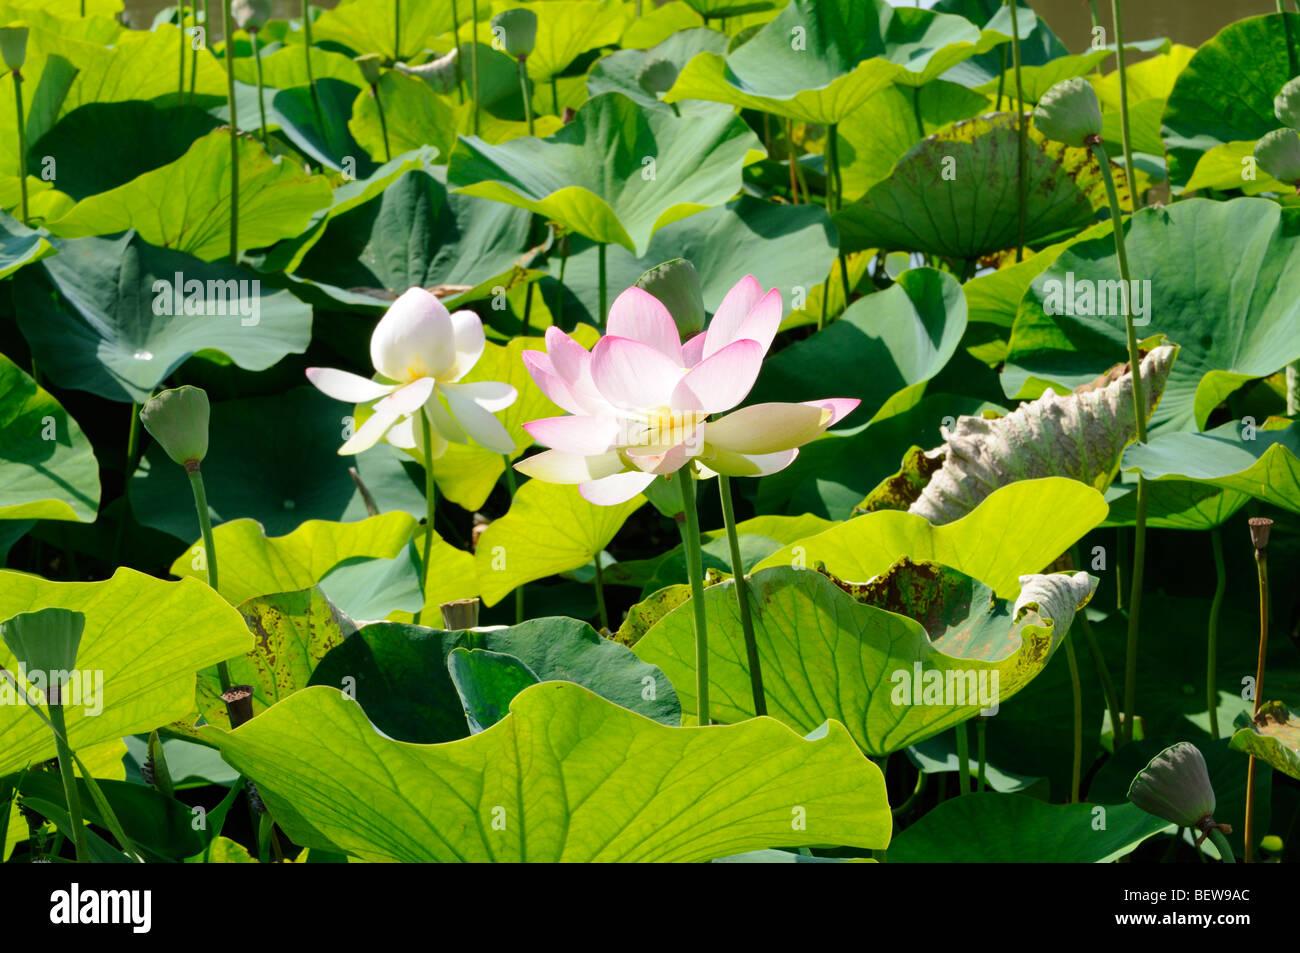 Wasserpflanze Nelumbo nucifera. - Water plant Nelumbo nucifera. Stock Photo